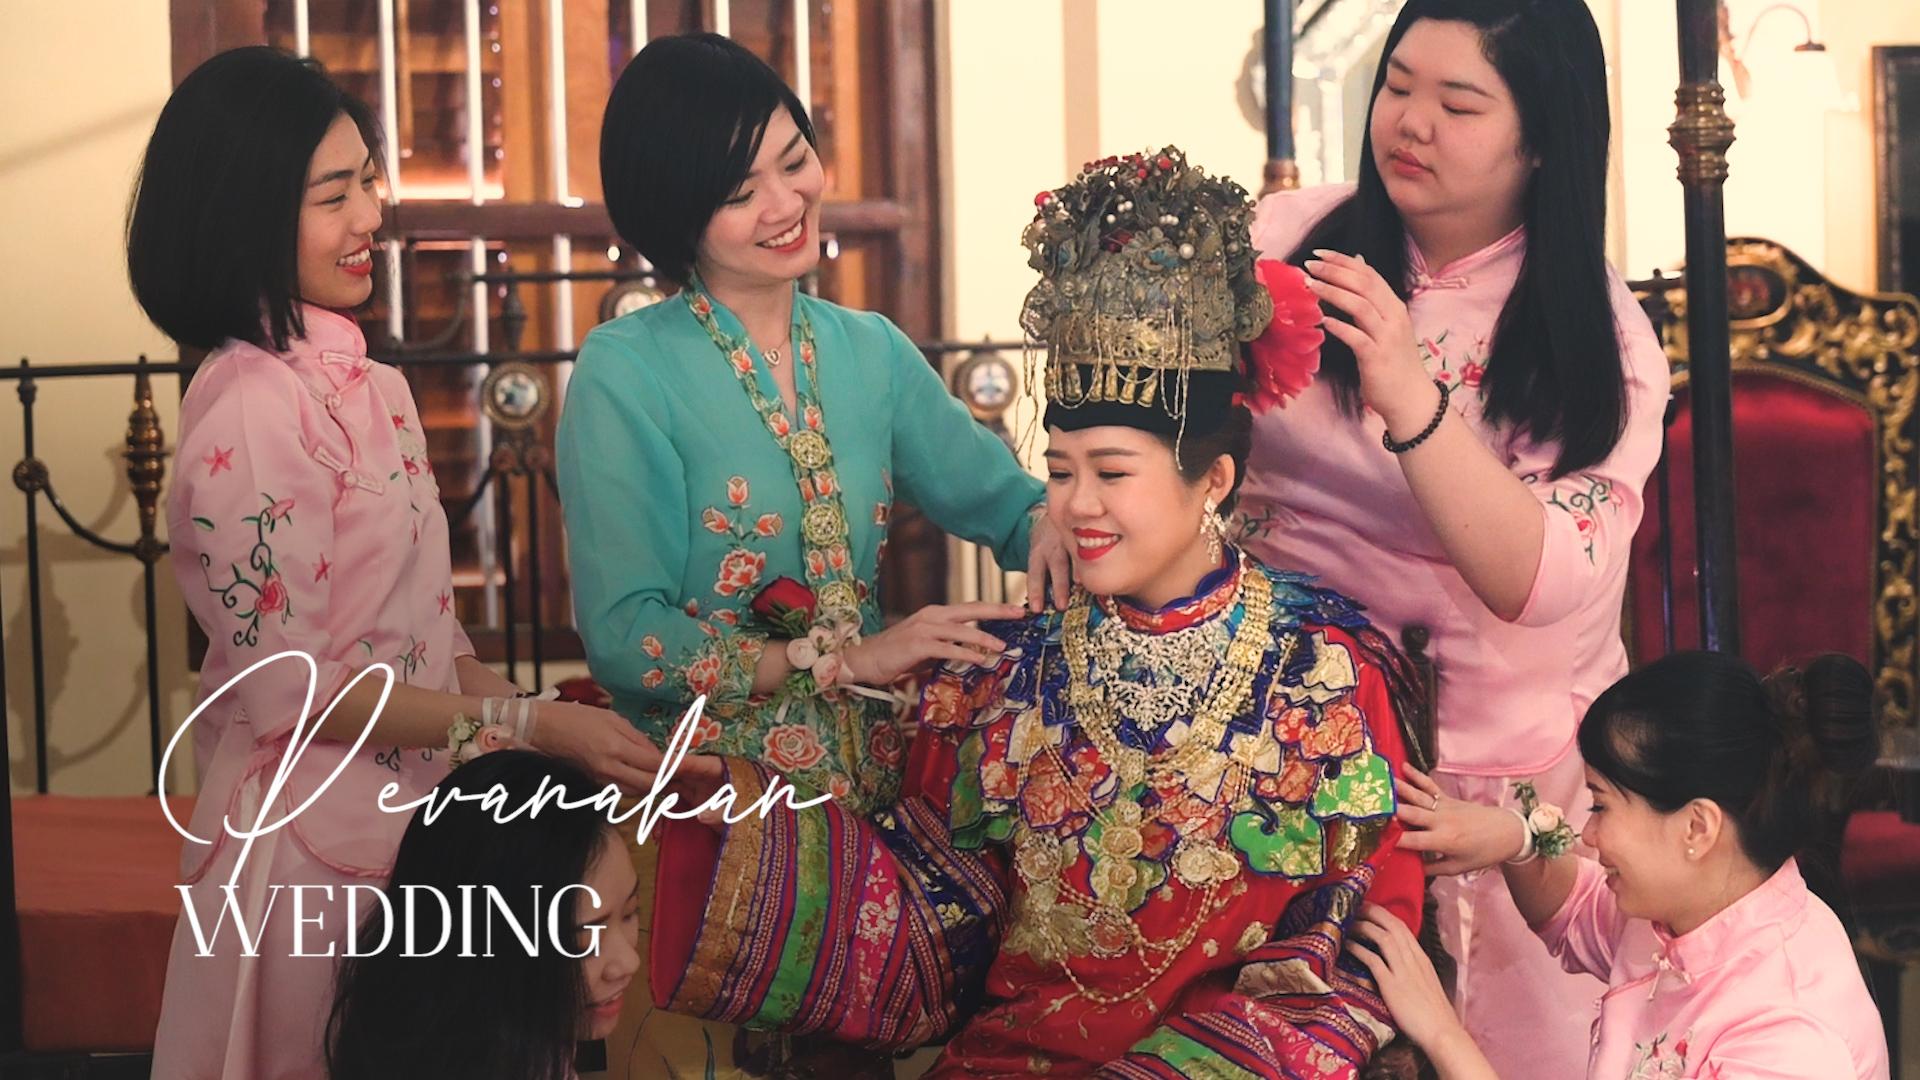 Peranakan Wedding in Penang, Malaysia